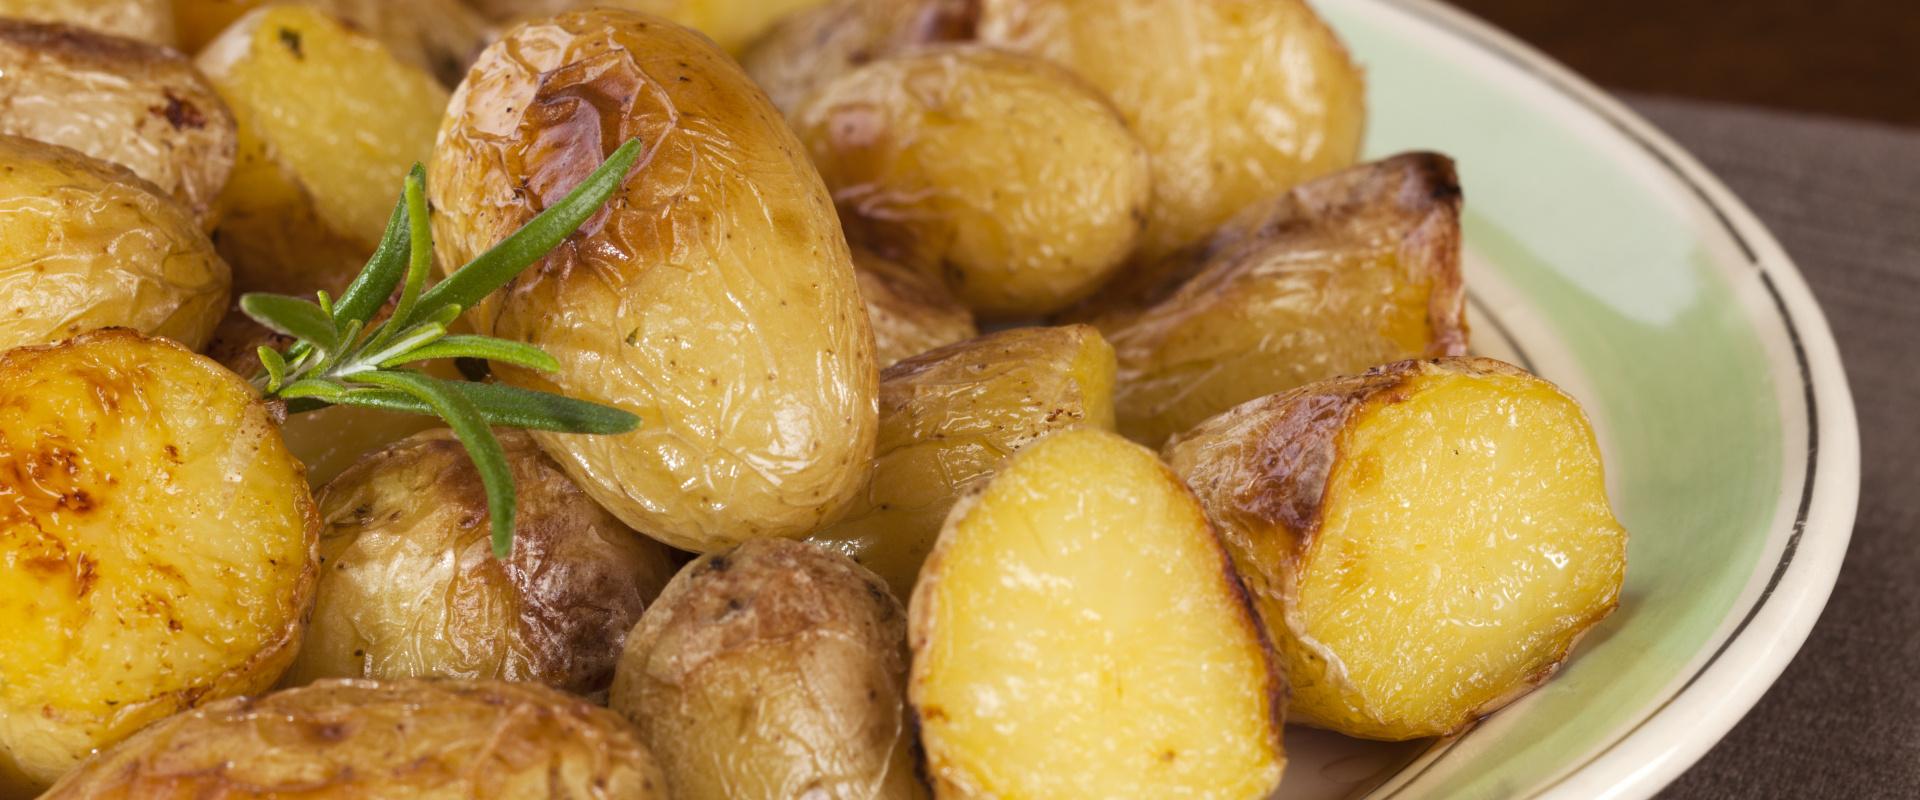 mustárral sült újkrumpli